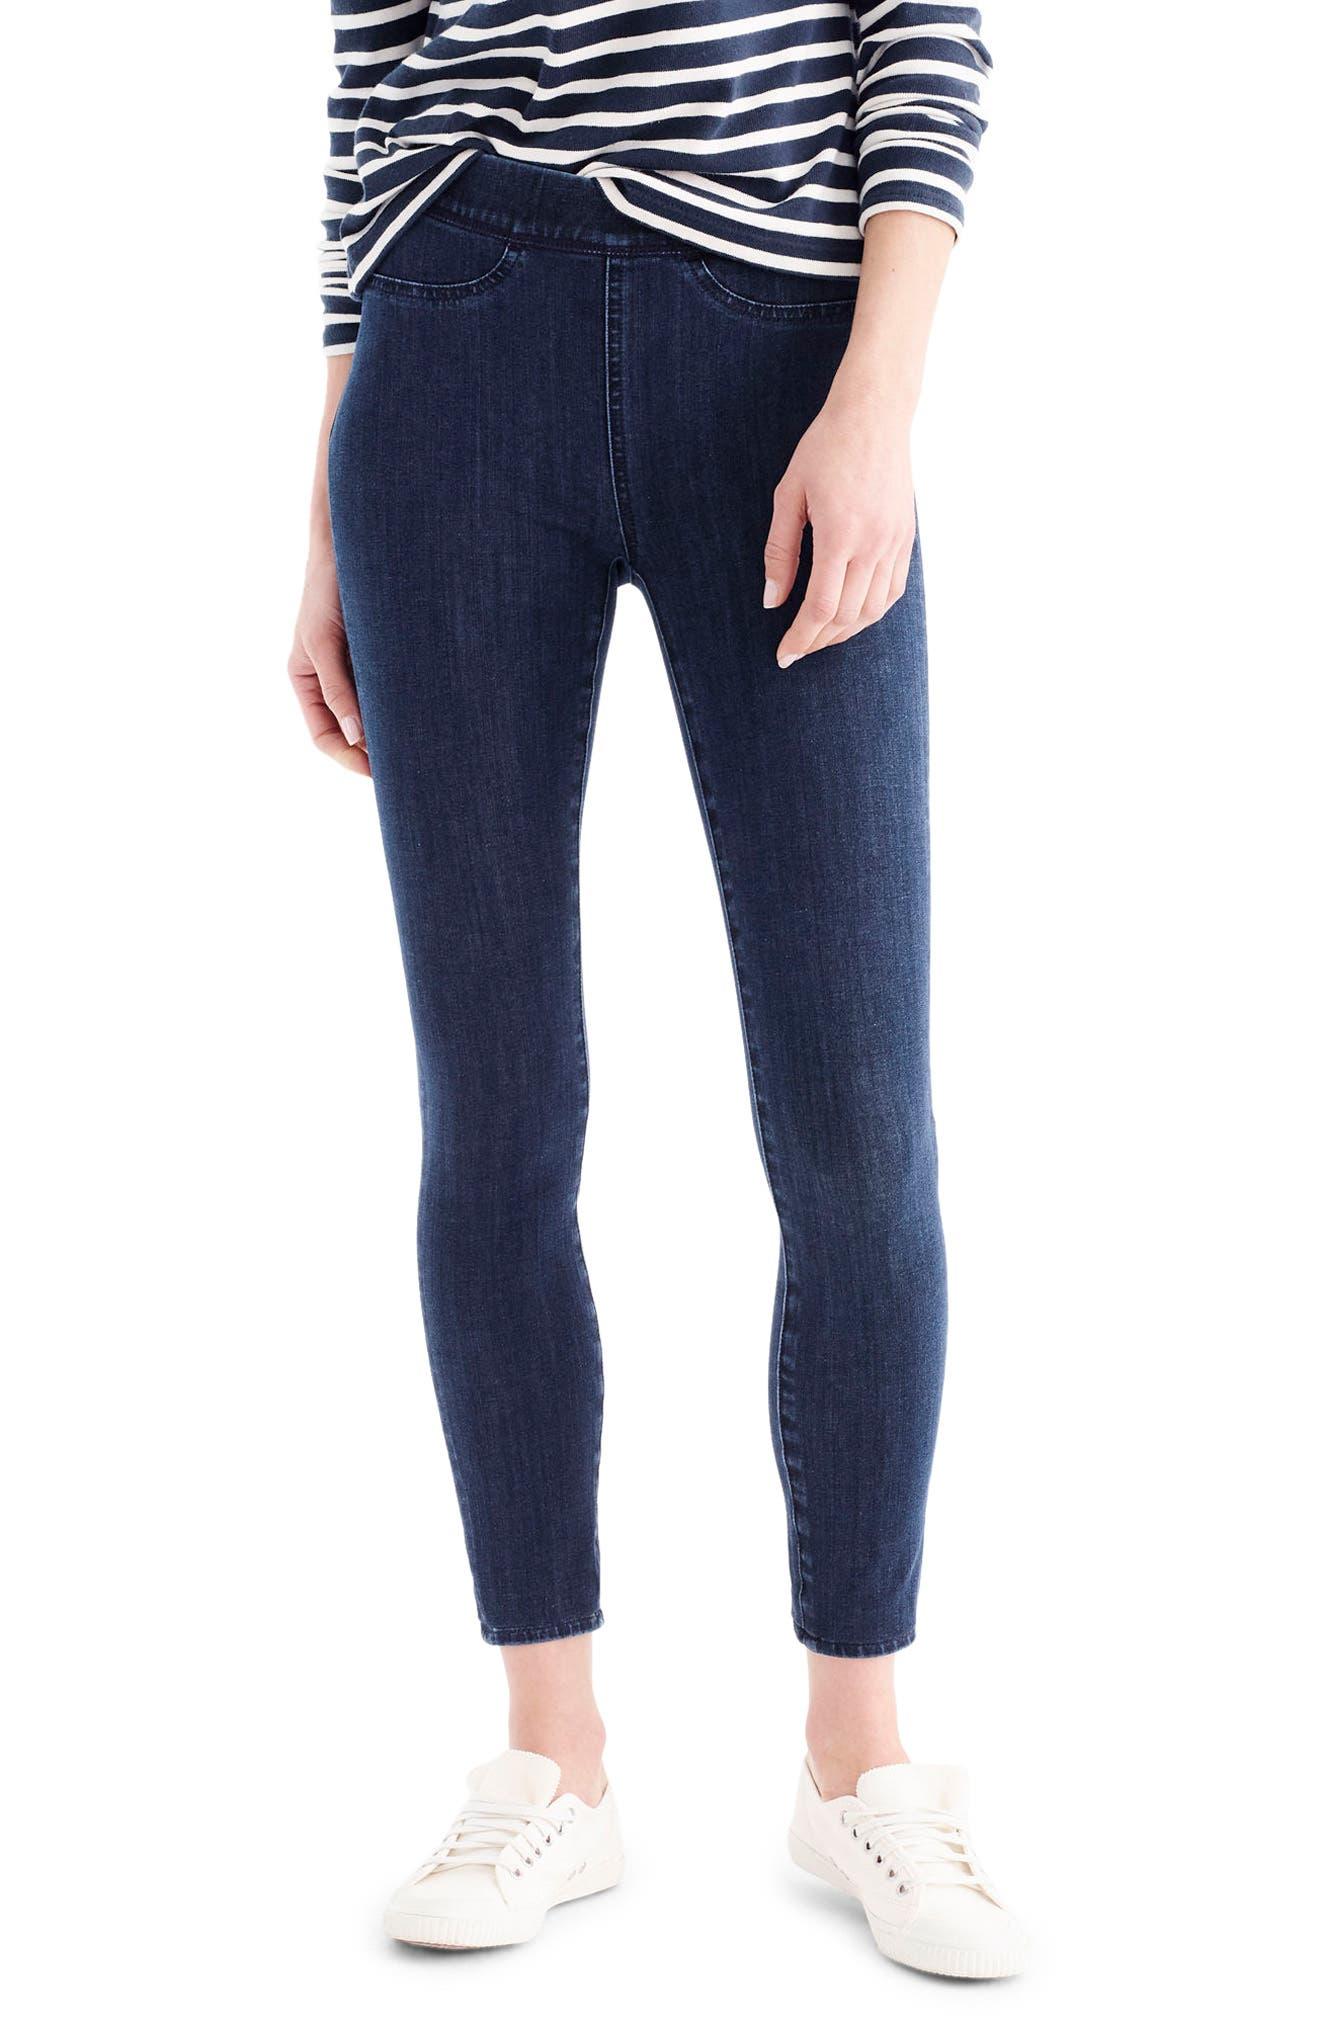 Alternate Image 1 Selected - J.Crew Pull-On Toothpick Indigo Jeans (Regular & Petite)